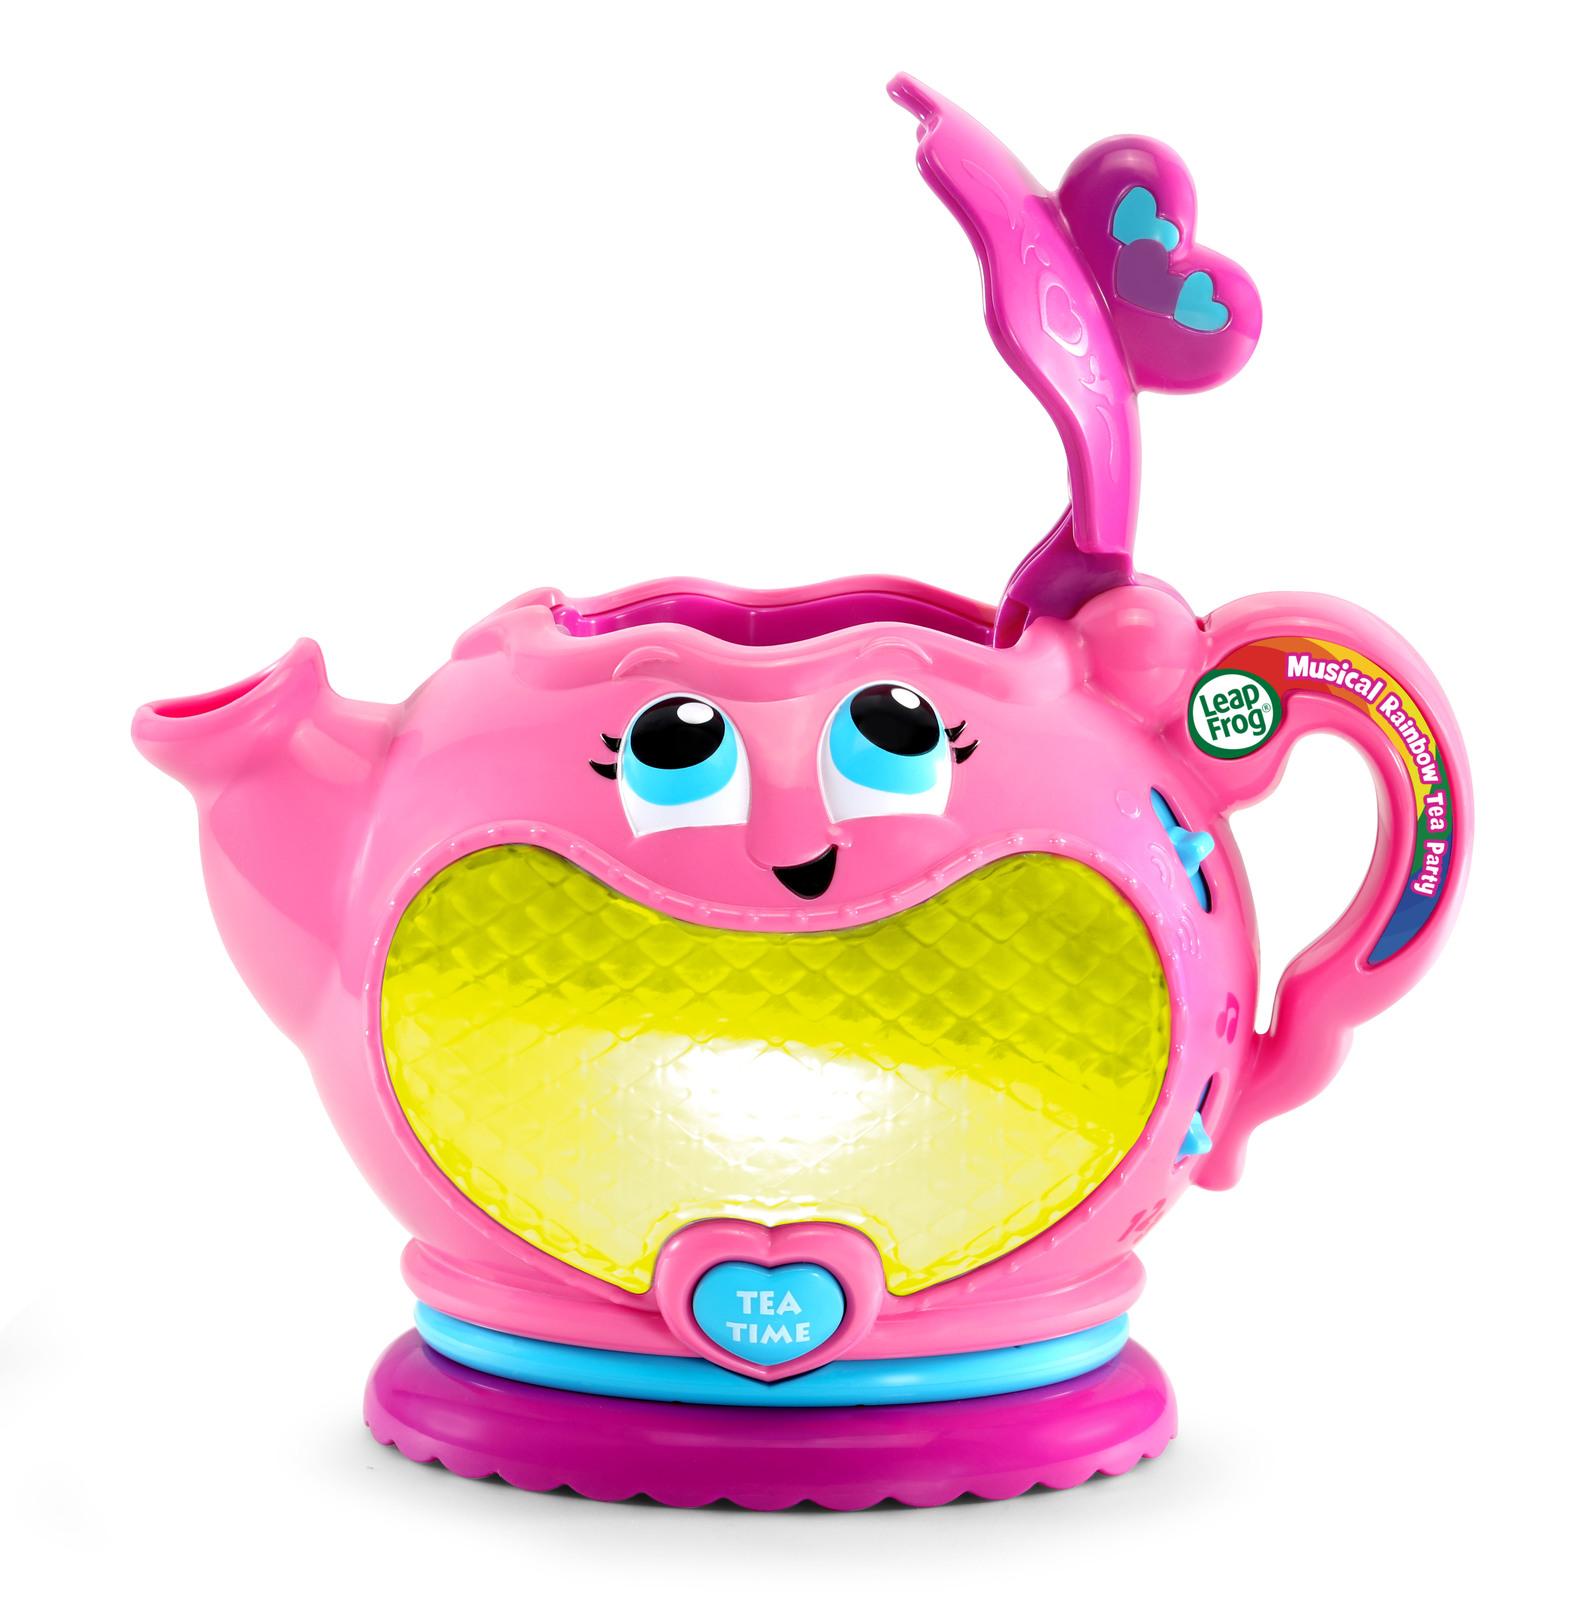 Leapfrog: Rainbow Tea Party - Playset image